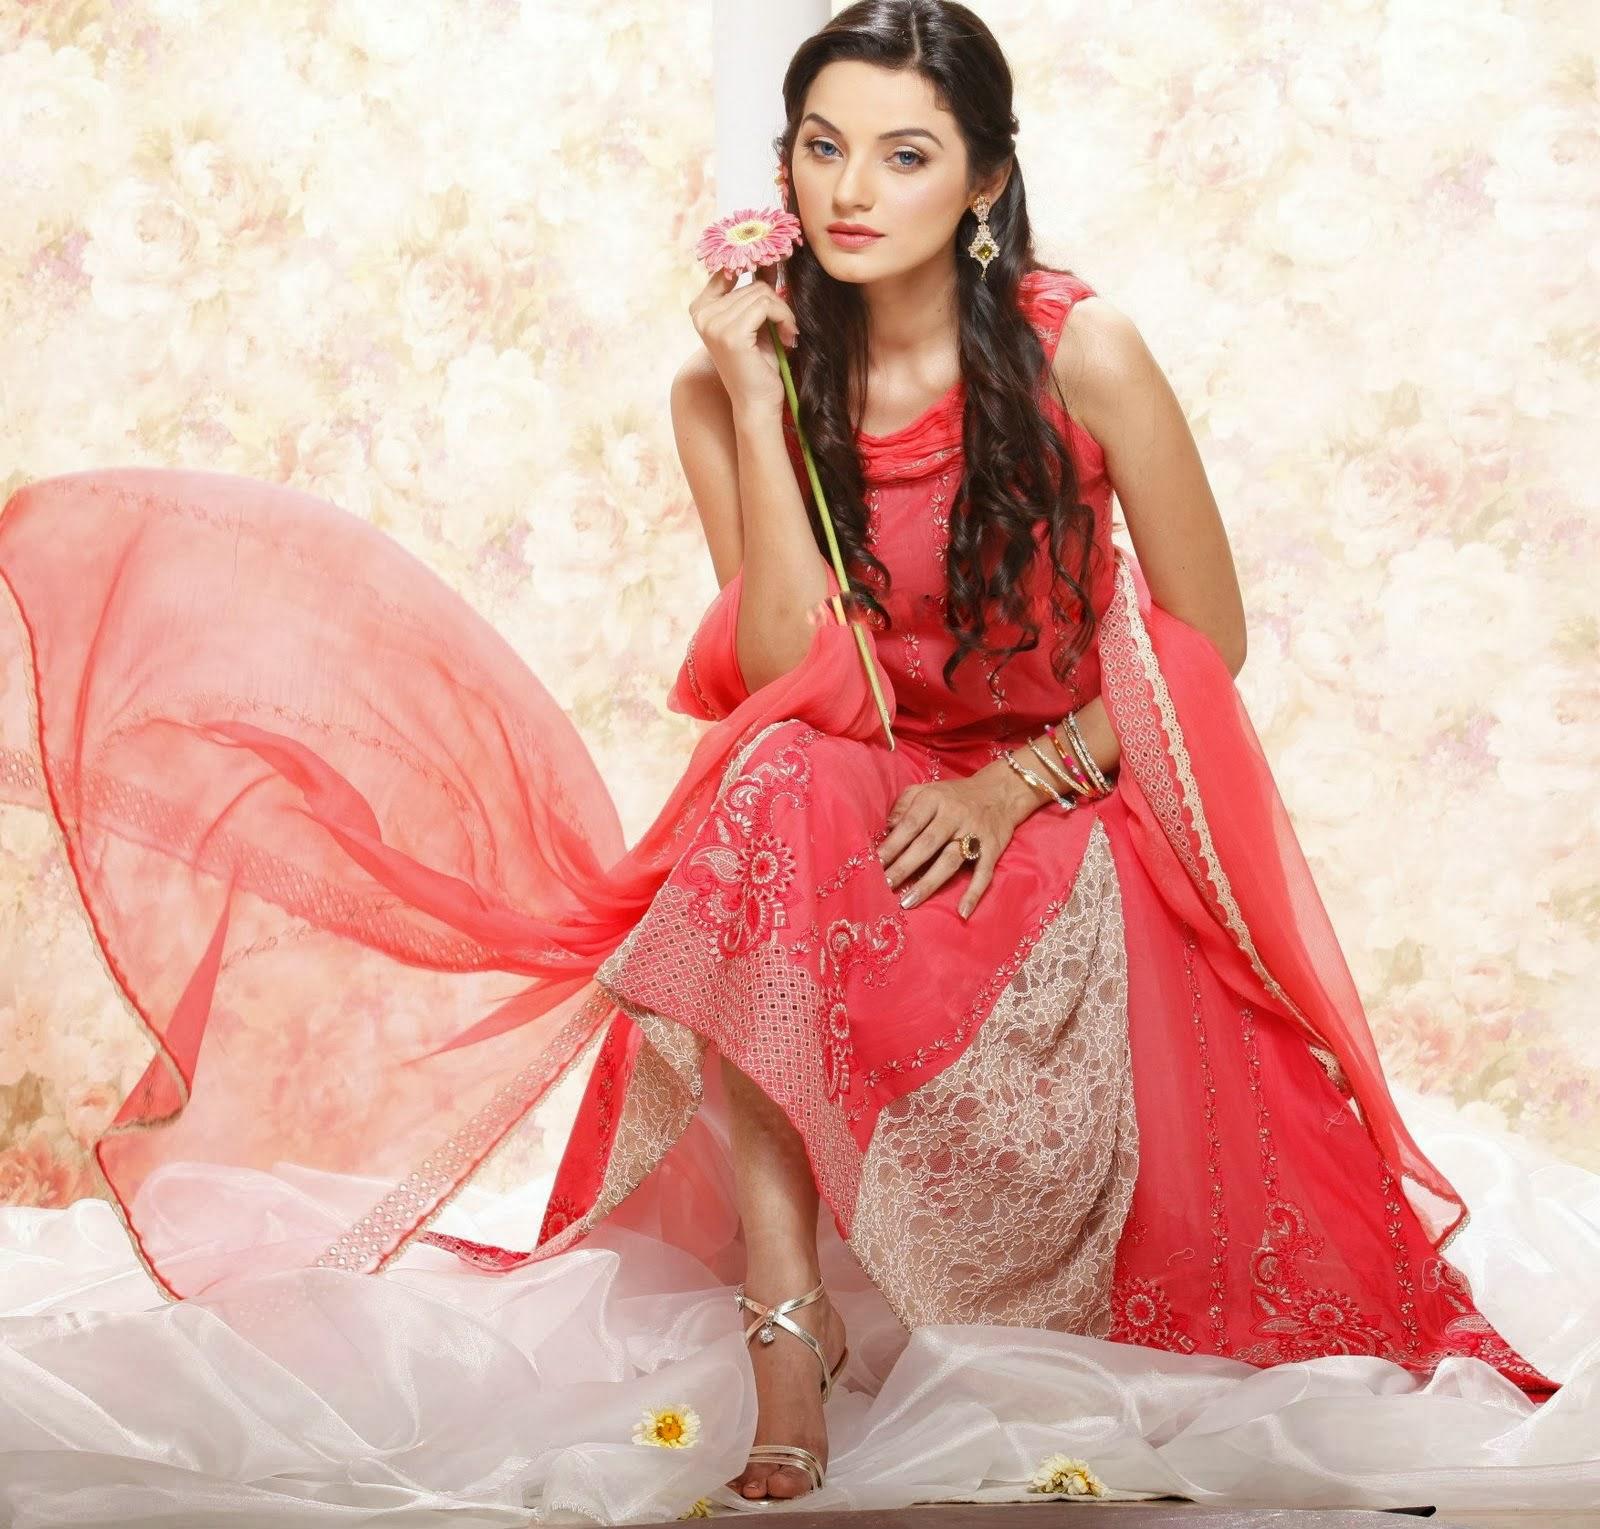 Pakistani Model Sadia Khan Hot Modeling Pics - Fashions Addres-3085